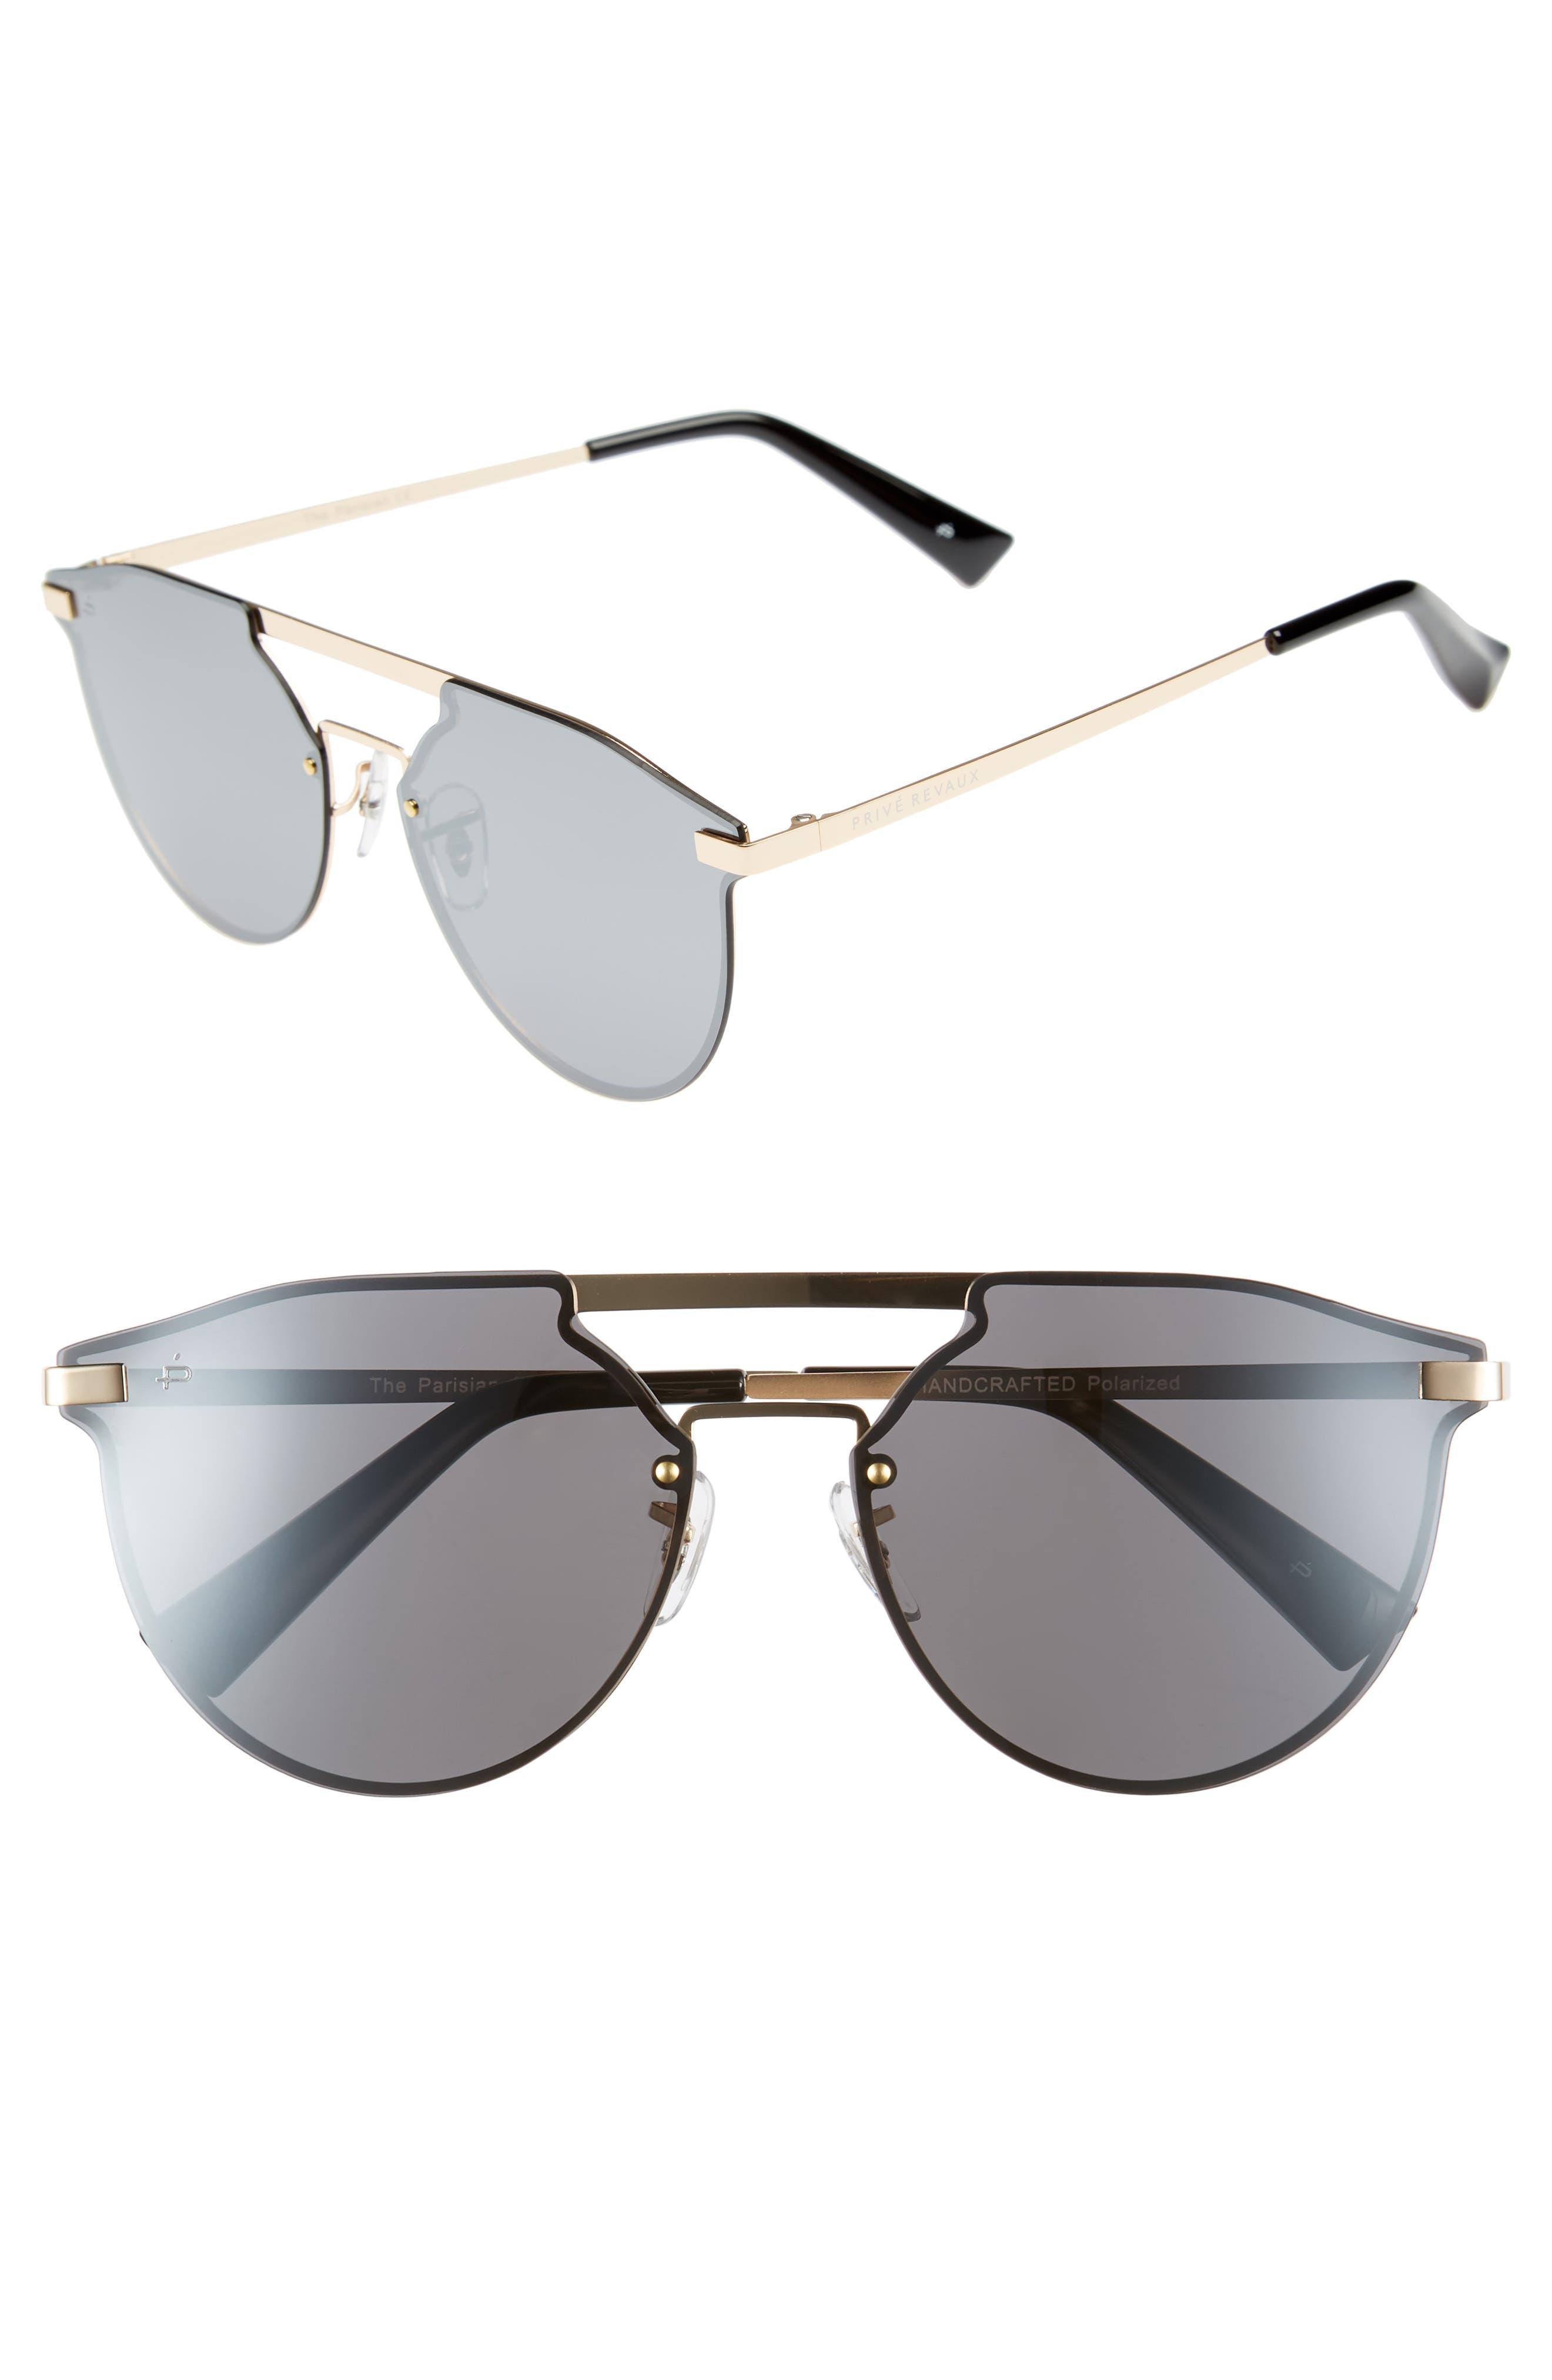 Privé Revaux The Parisian 62mm Aviator Sunglasses,                         Main,                         color, 040